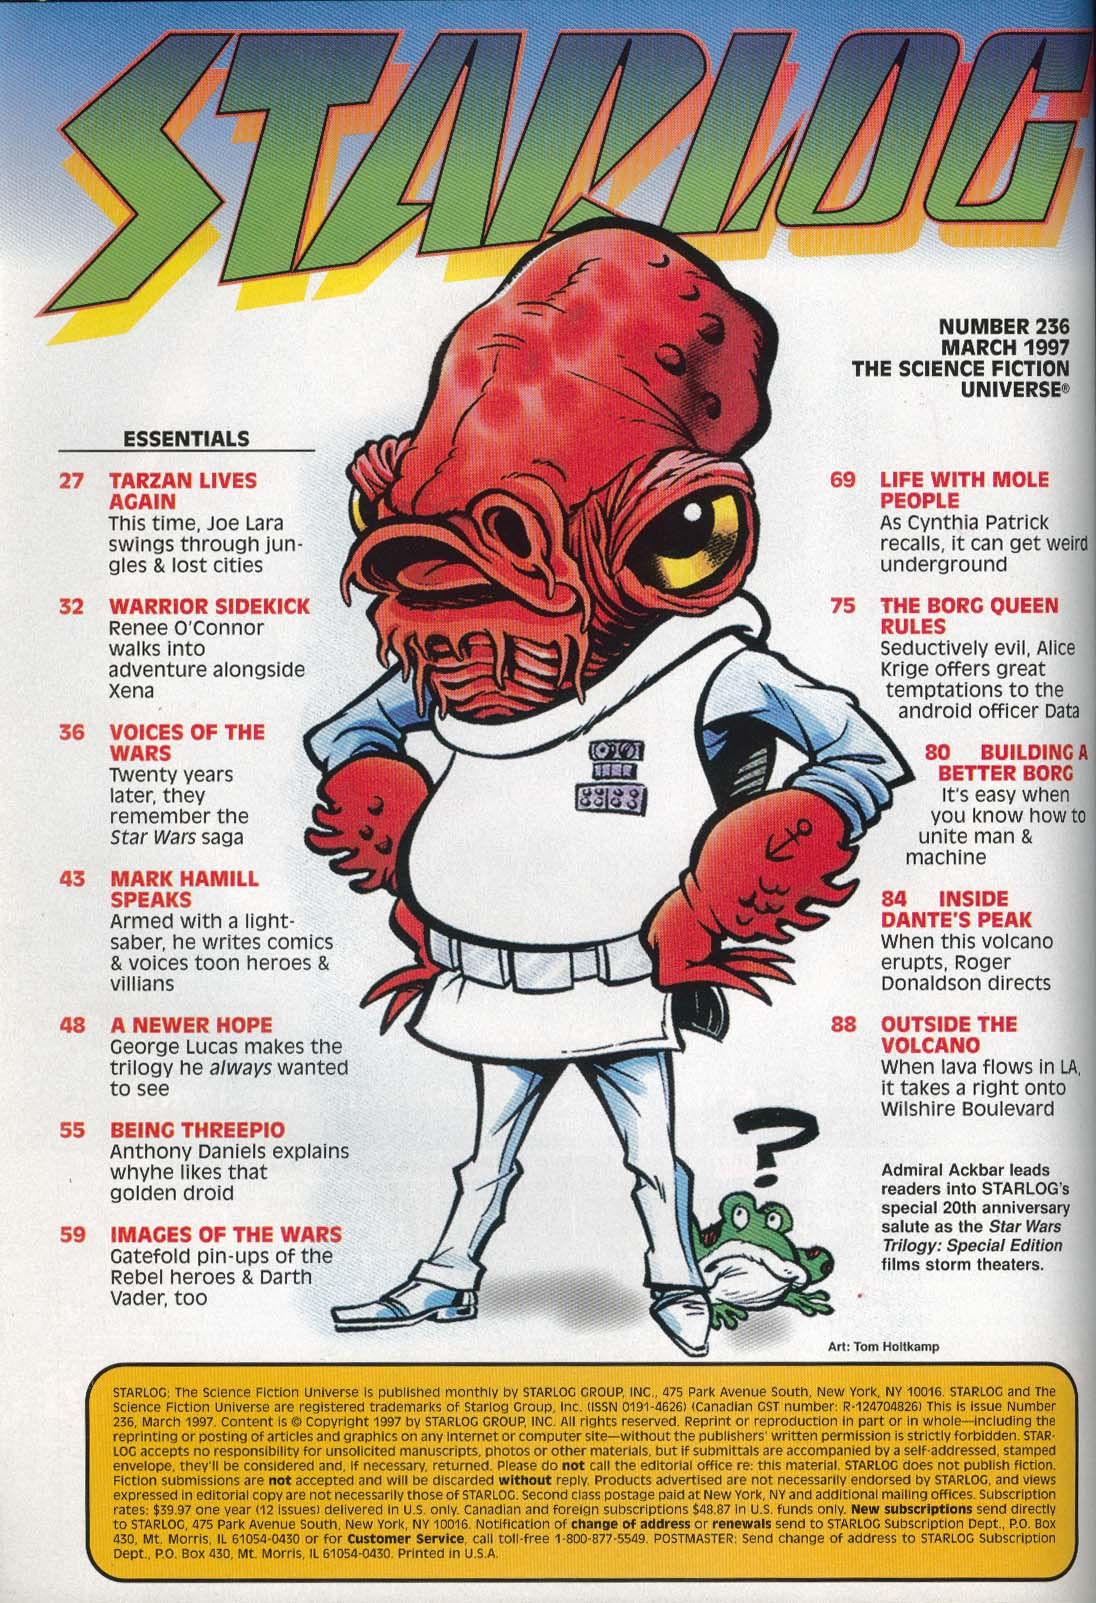 STARLOG #236 Star Wars Mark Hamill Anthony Daniels Trek First Contact 3 1997